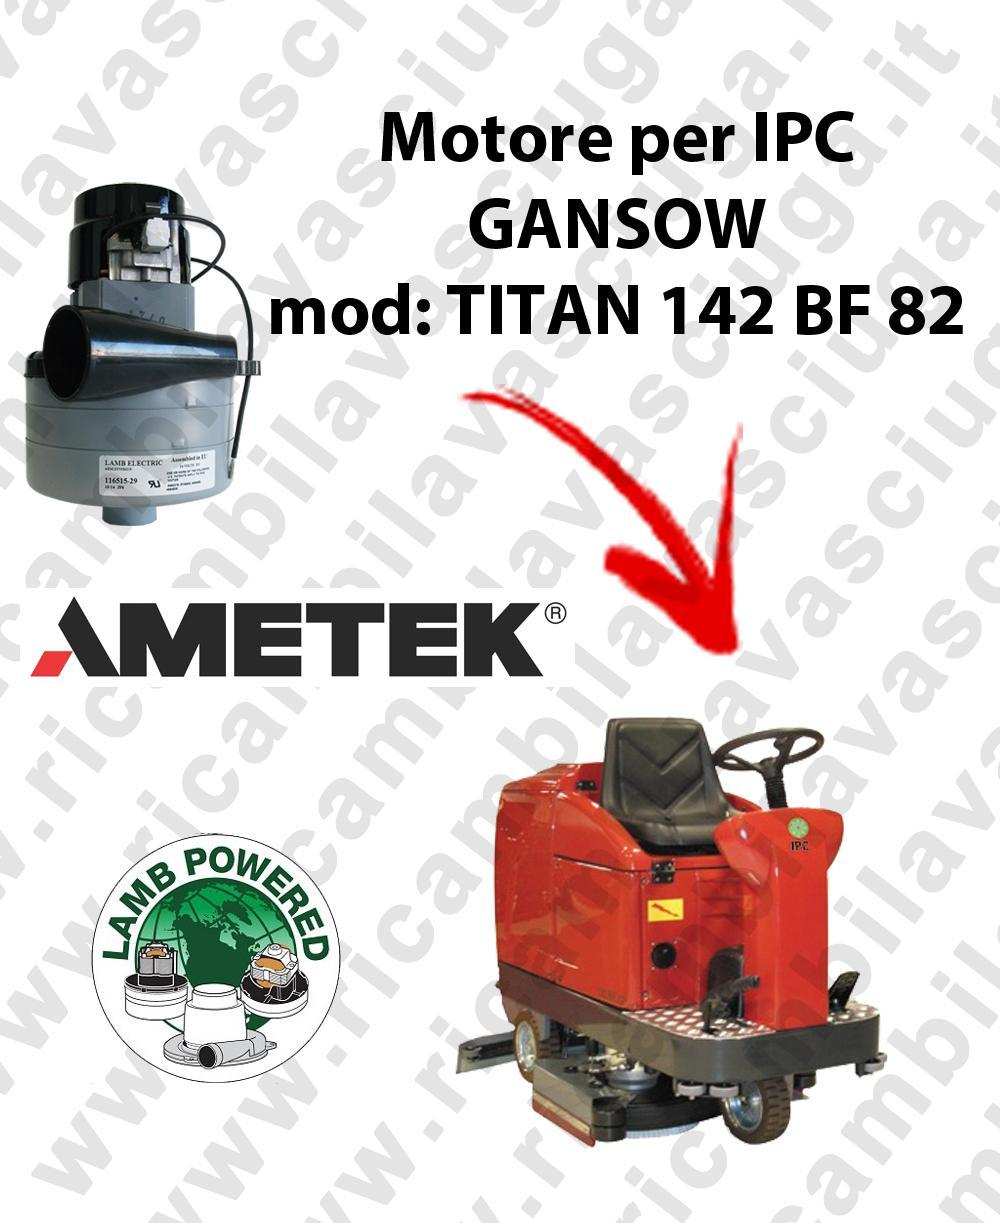 TITAN 142 BF 82 LAMB AMETEK vacuum motor for scrubber dryer IPC GANSOW